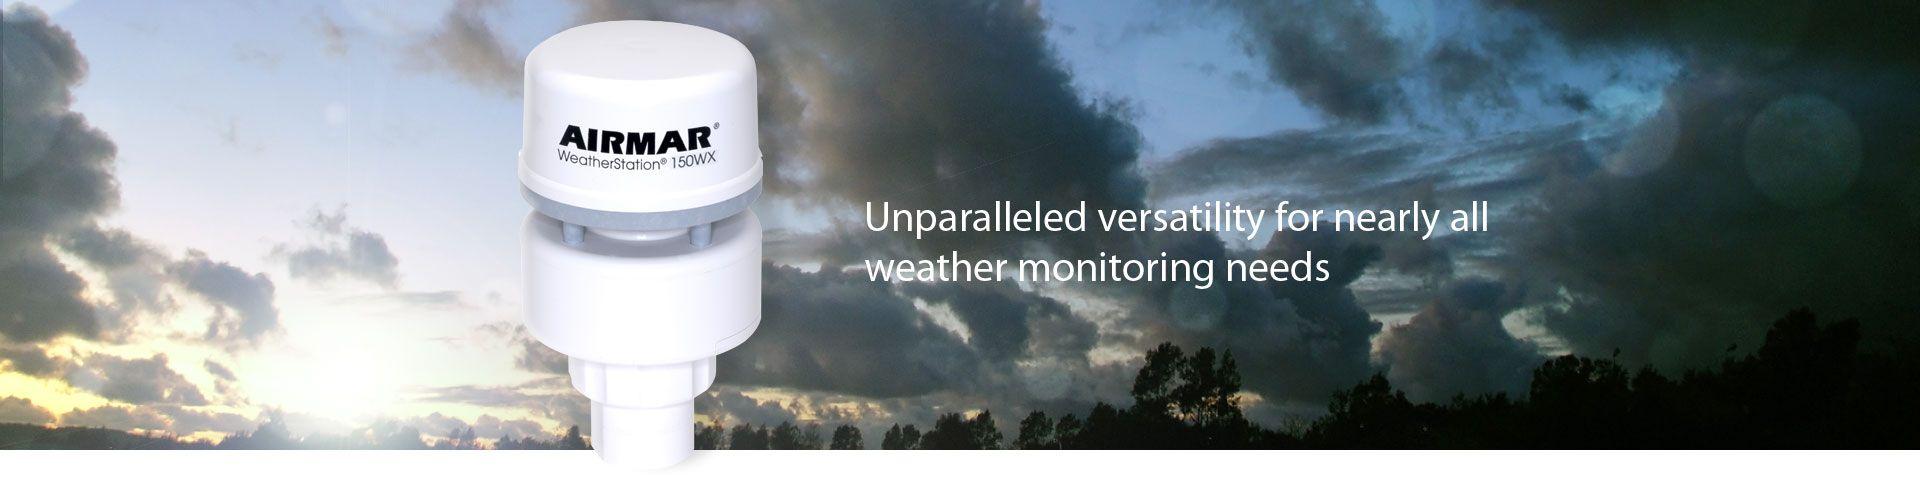 Airmar 150WX Ultrasonic WeatherStation Instrument